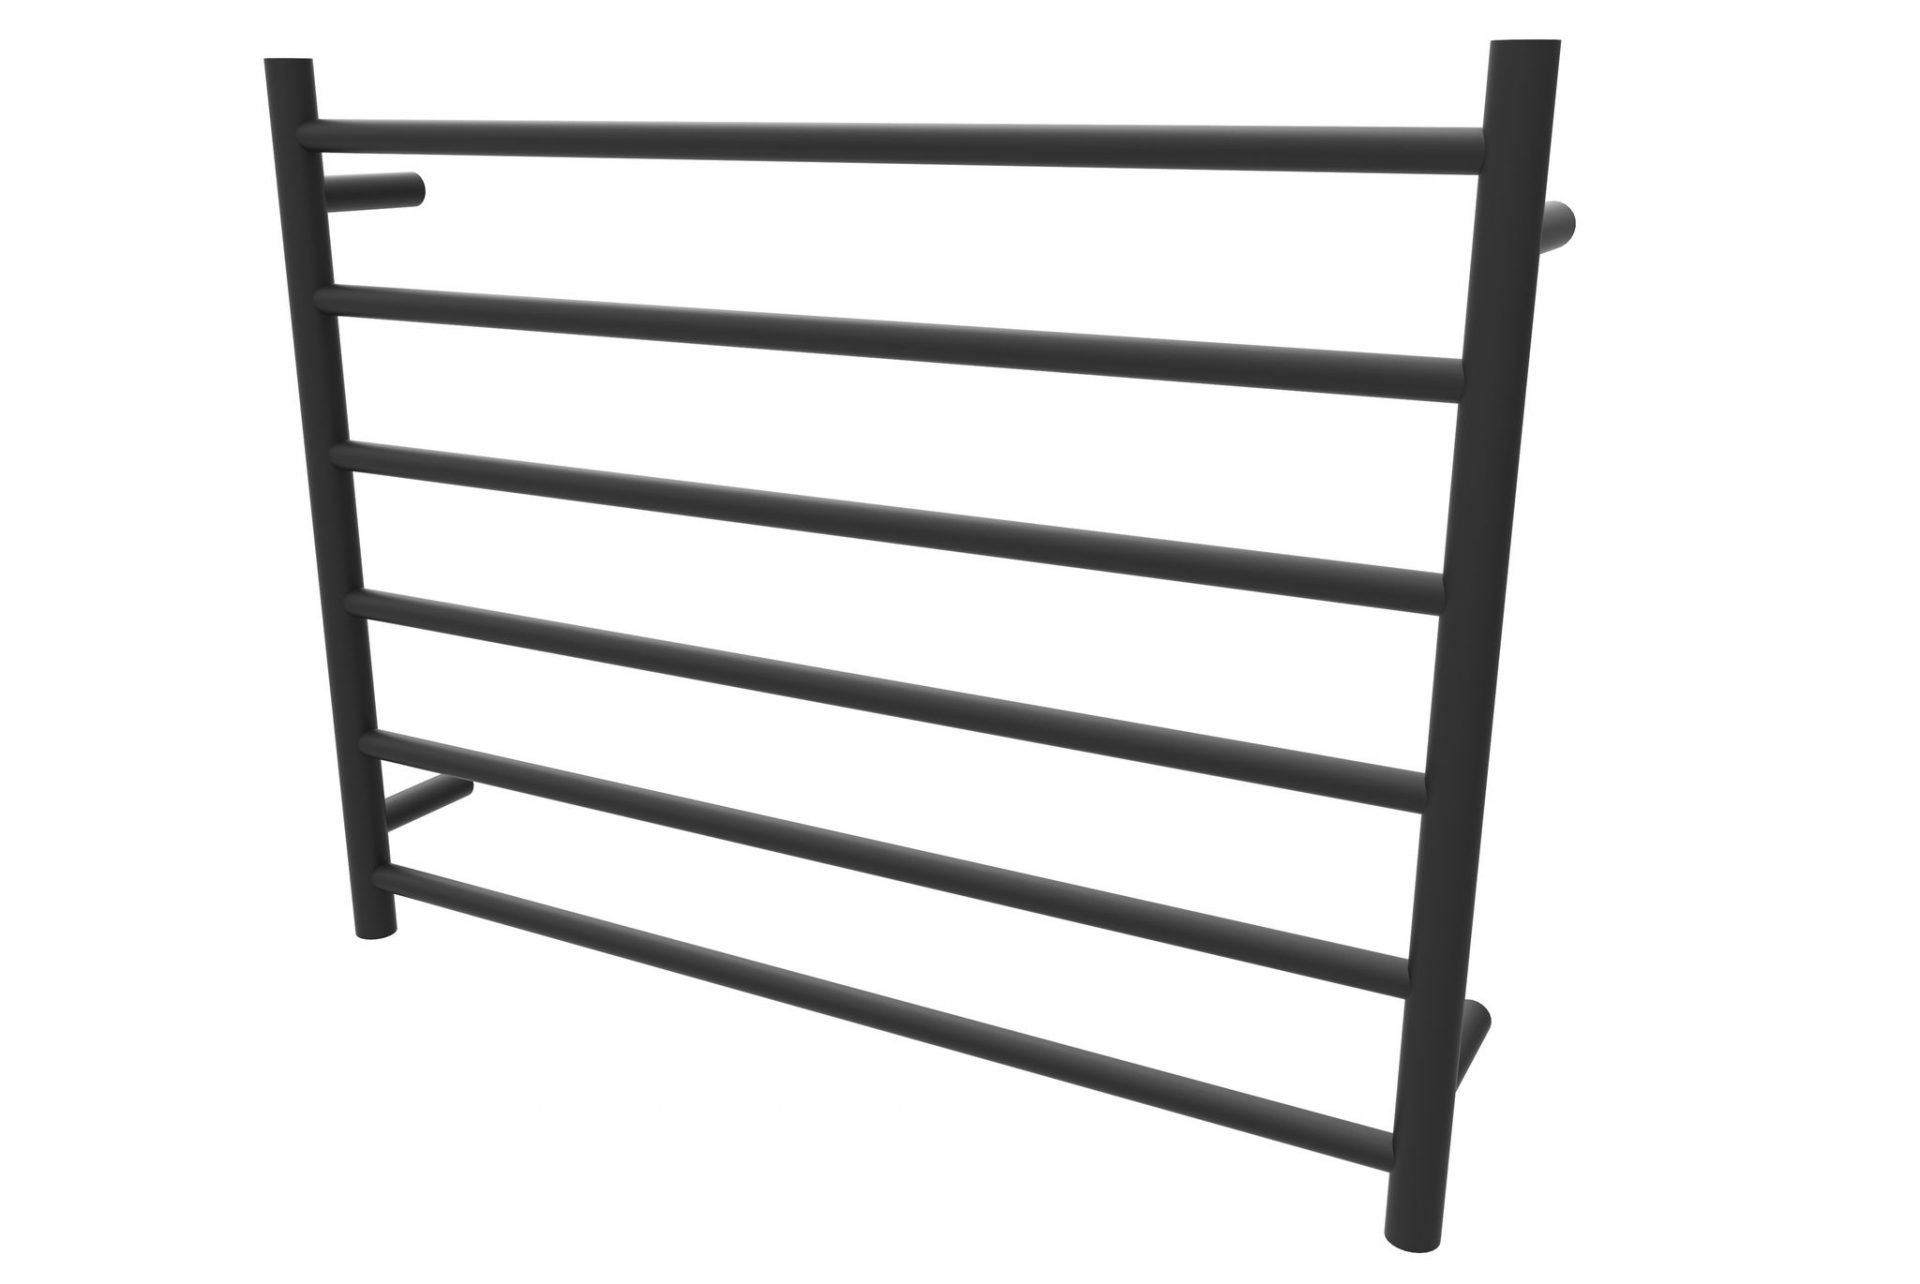 Allegra Matte Black 6 Bar Wide Heated Towel Rail